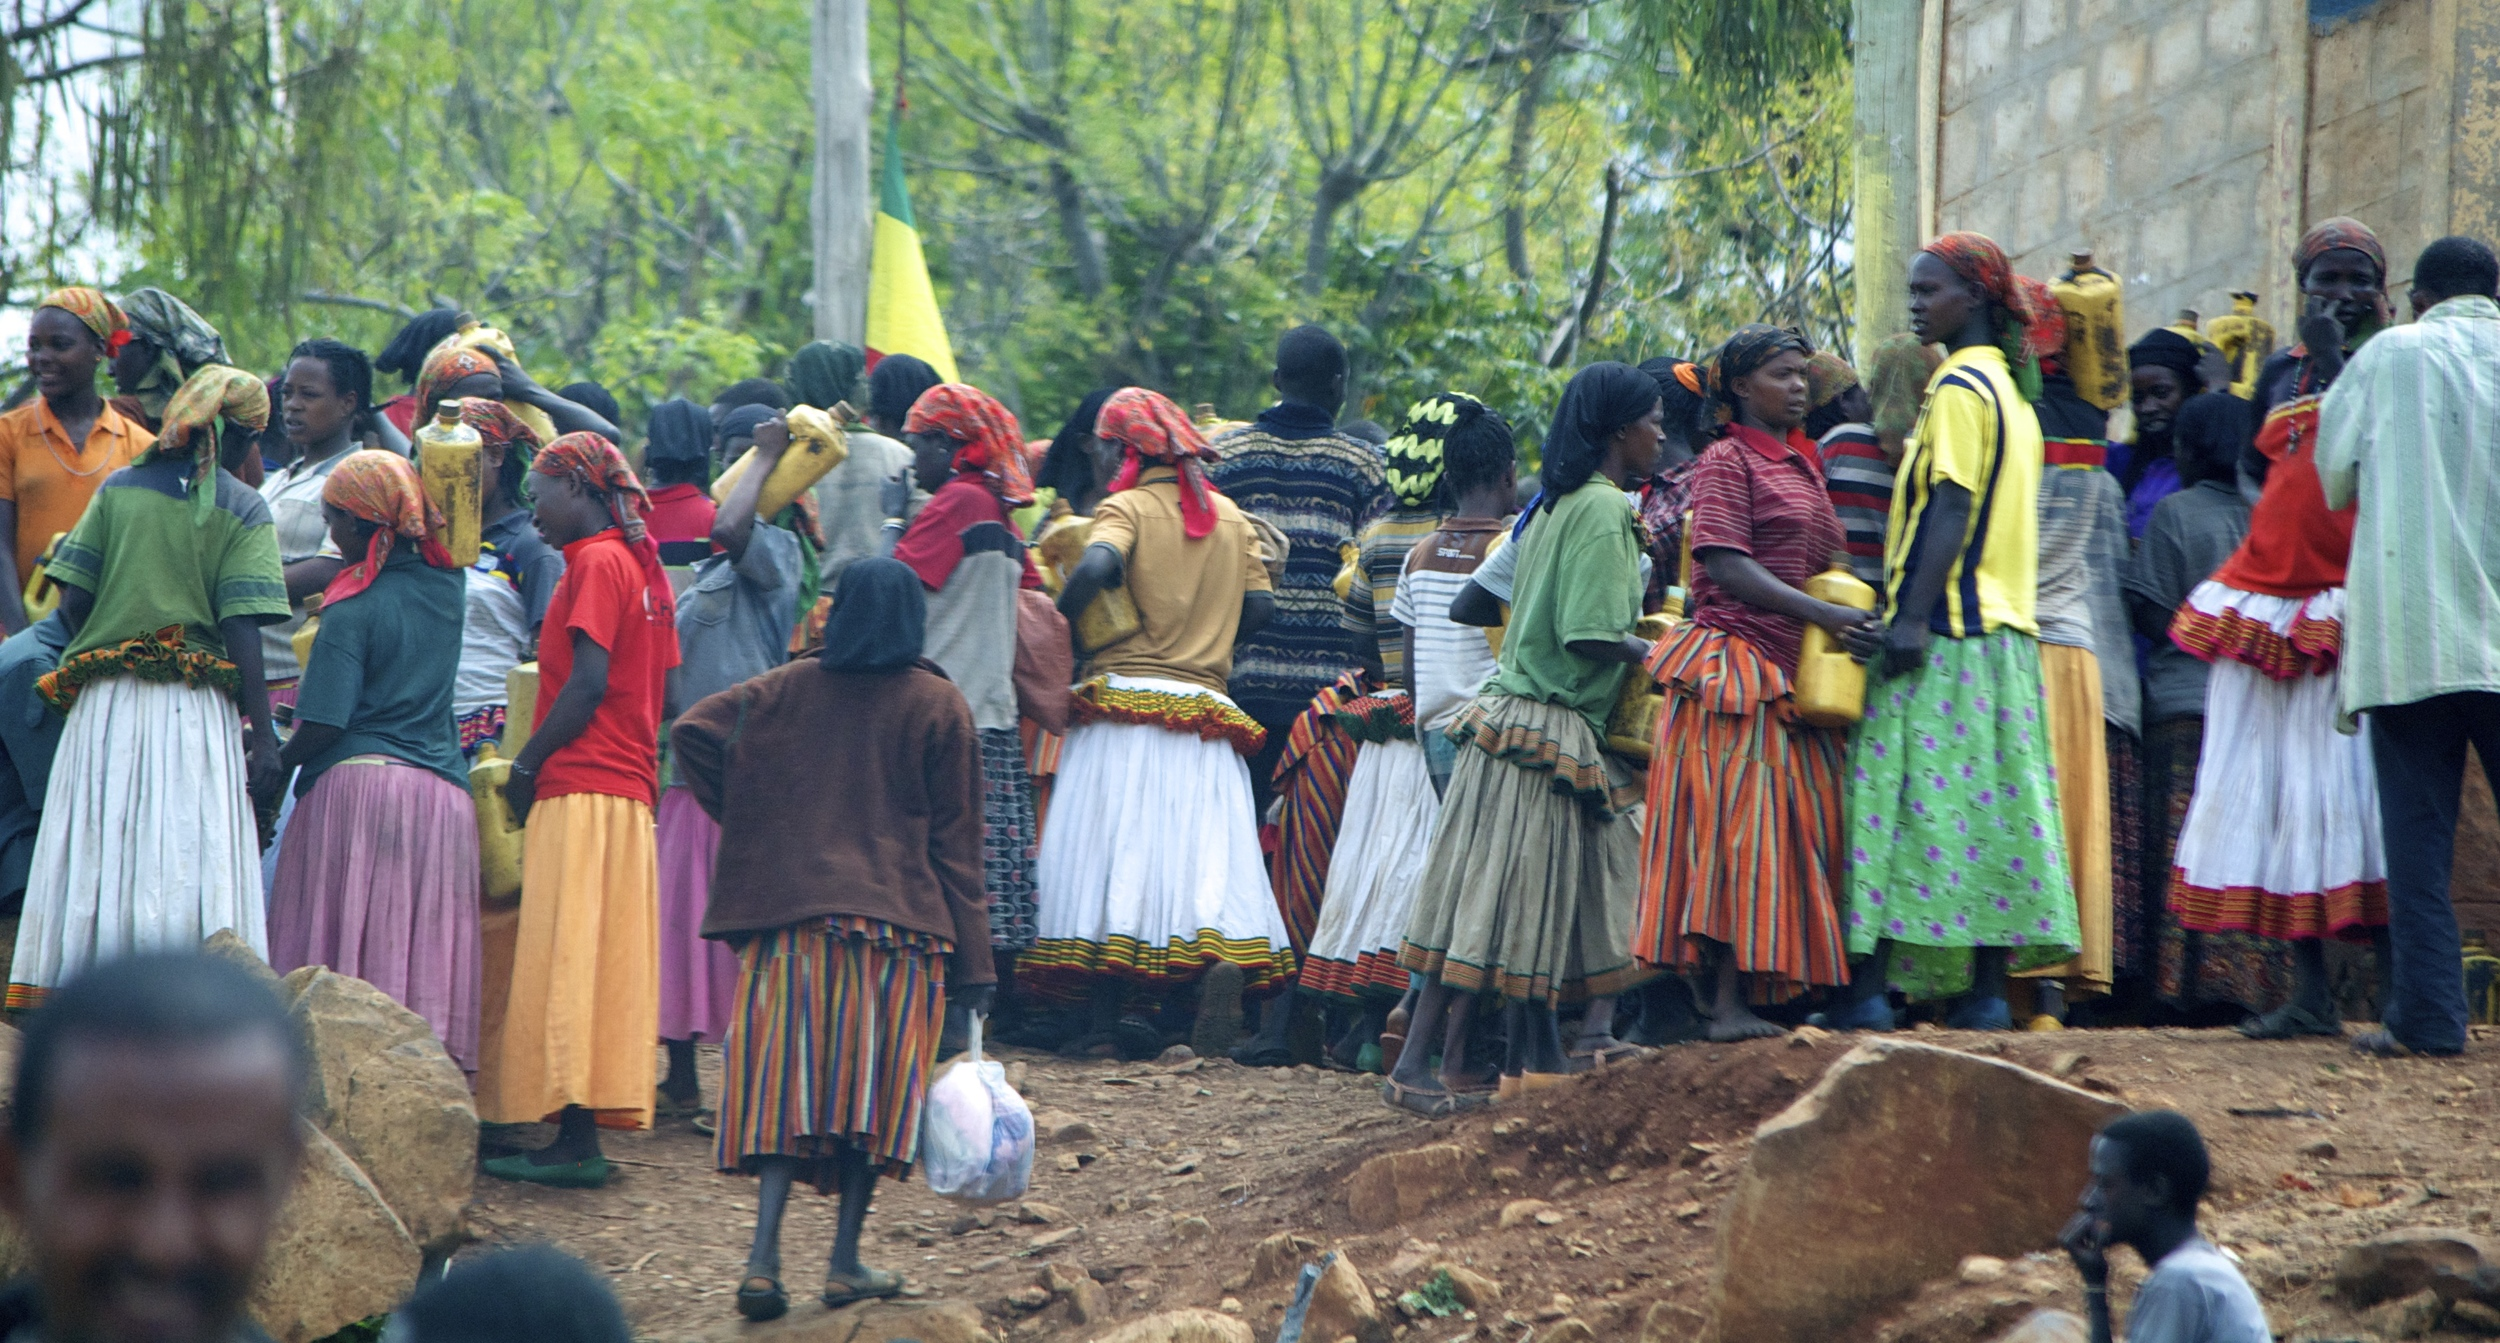 A village gathering